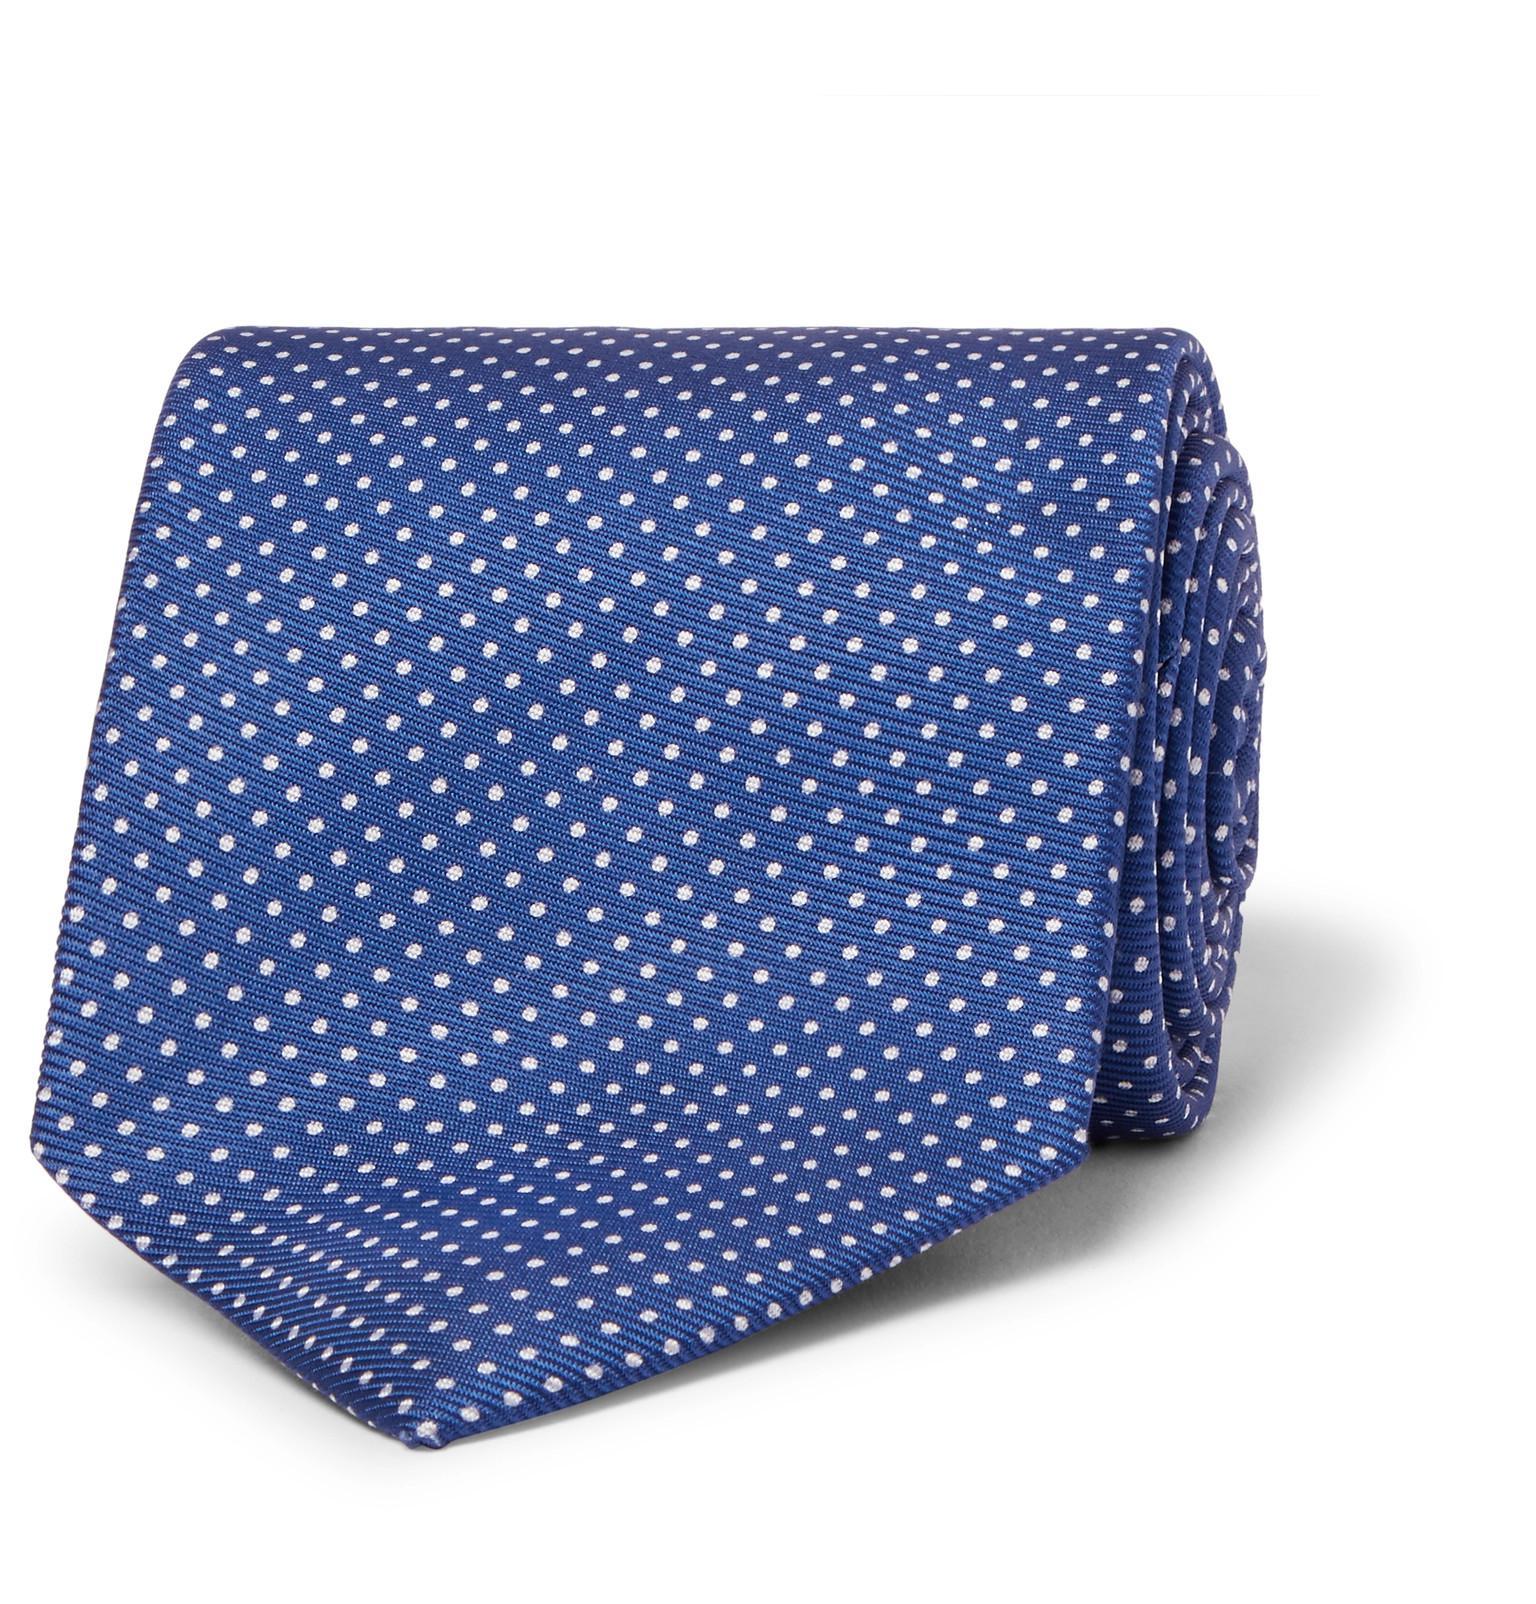 9cm Printed Silk Tie Emma Willis Fashionable Cheap Online Sale Visit New Buy Cheap Release Dates m4YcXaKzF6